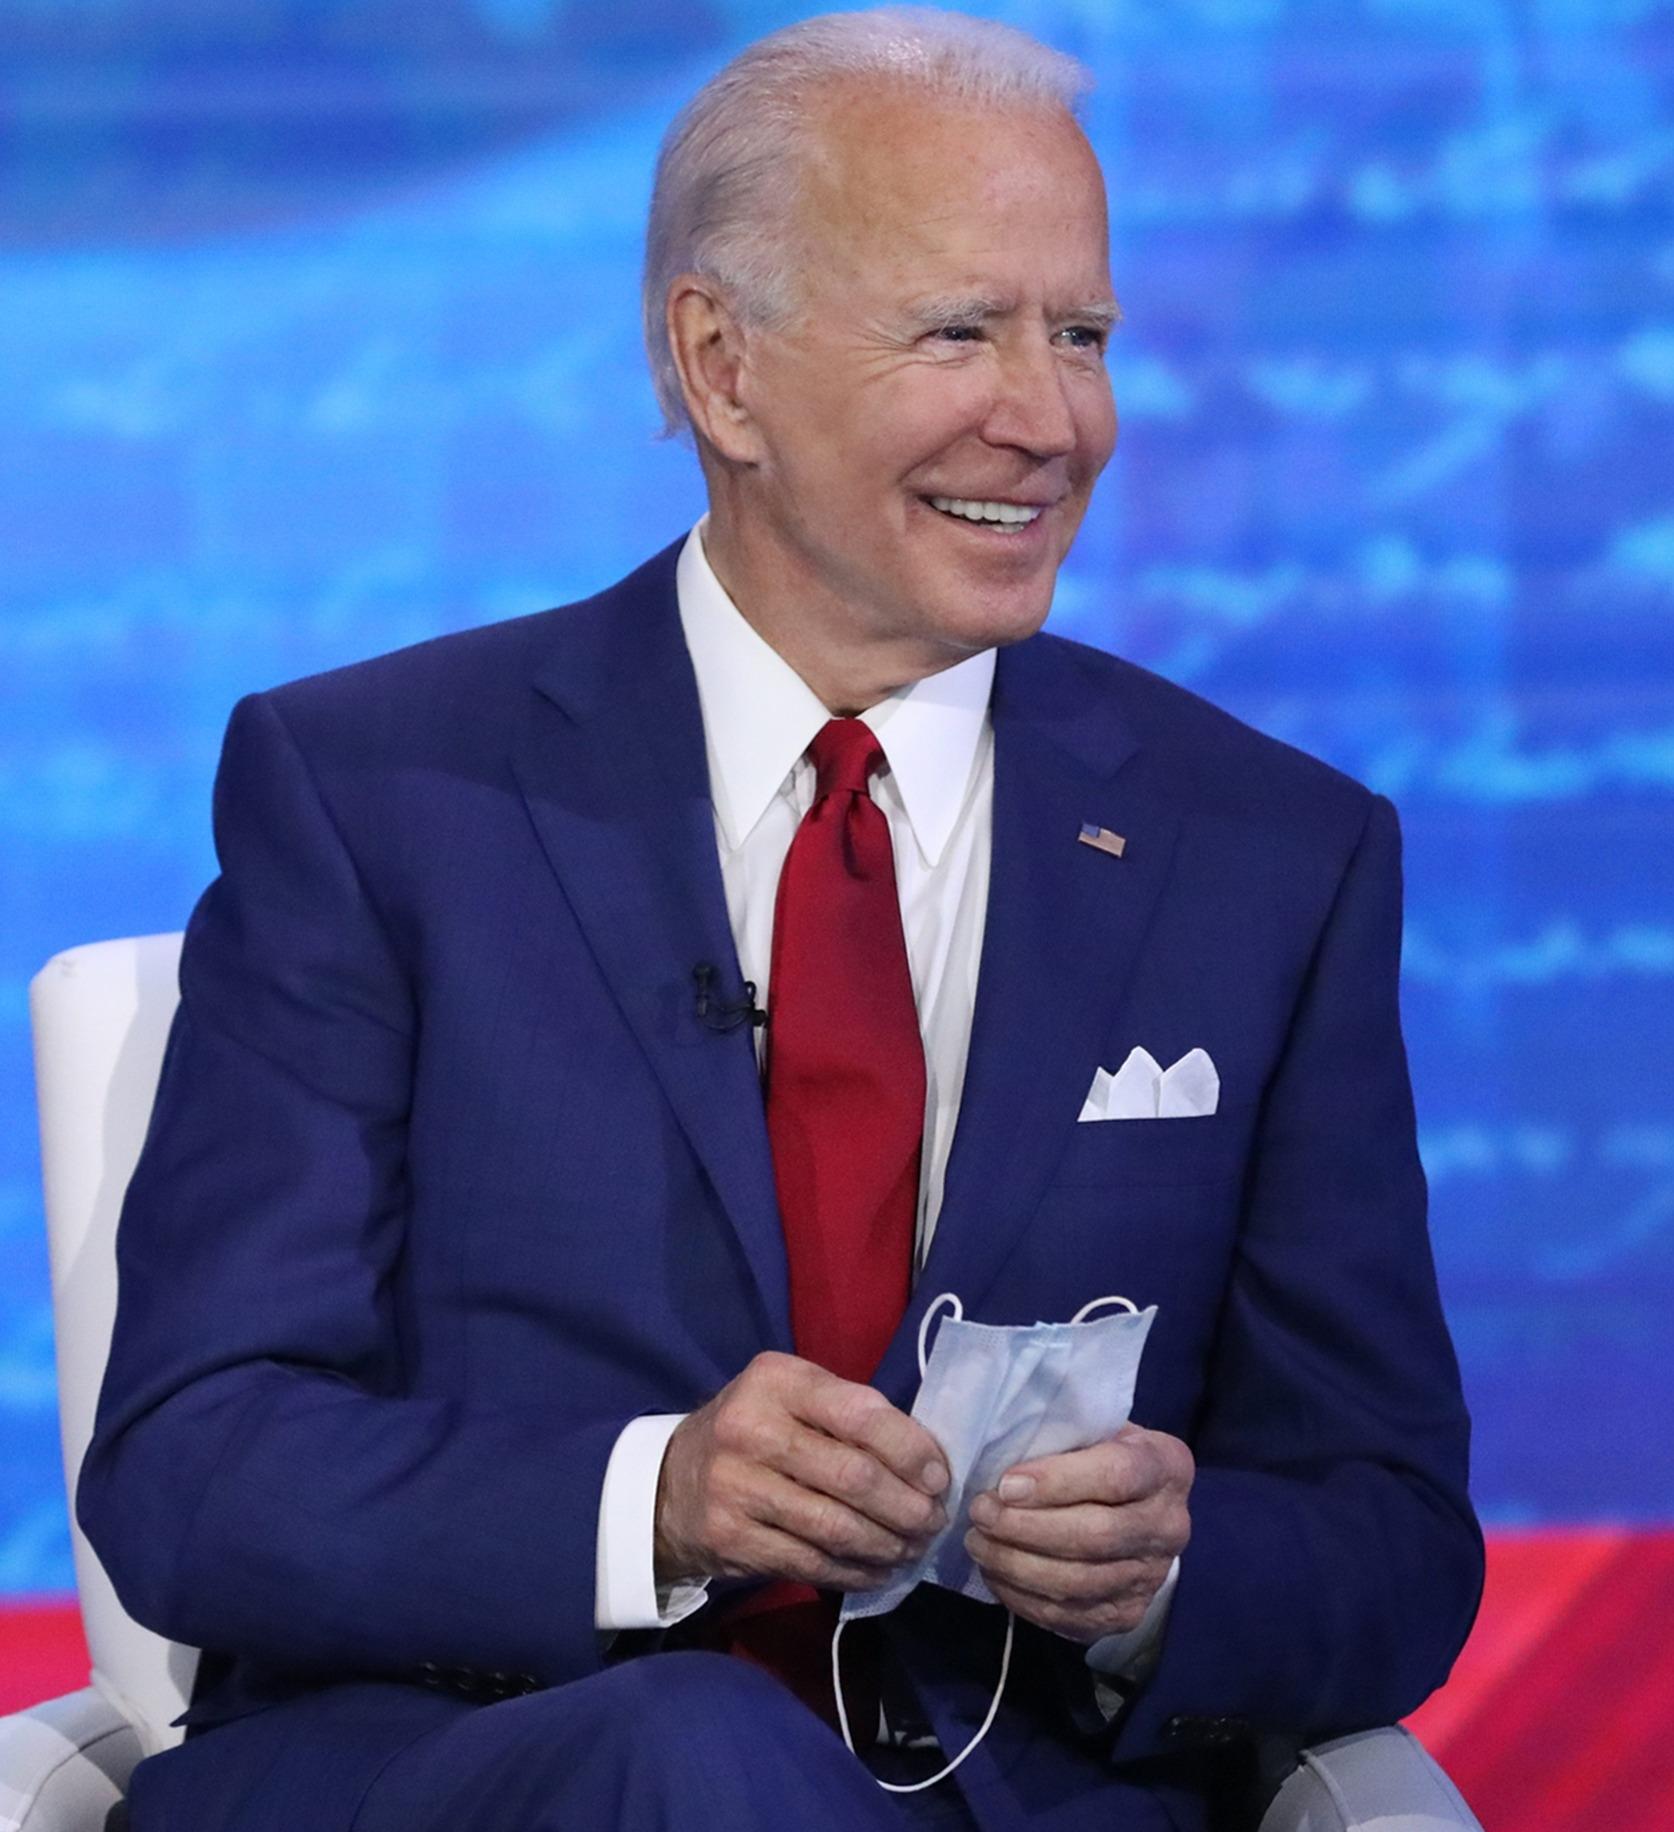 Joe Biden dijo que tal reunión nunca tuvo lugar